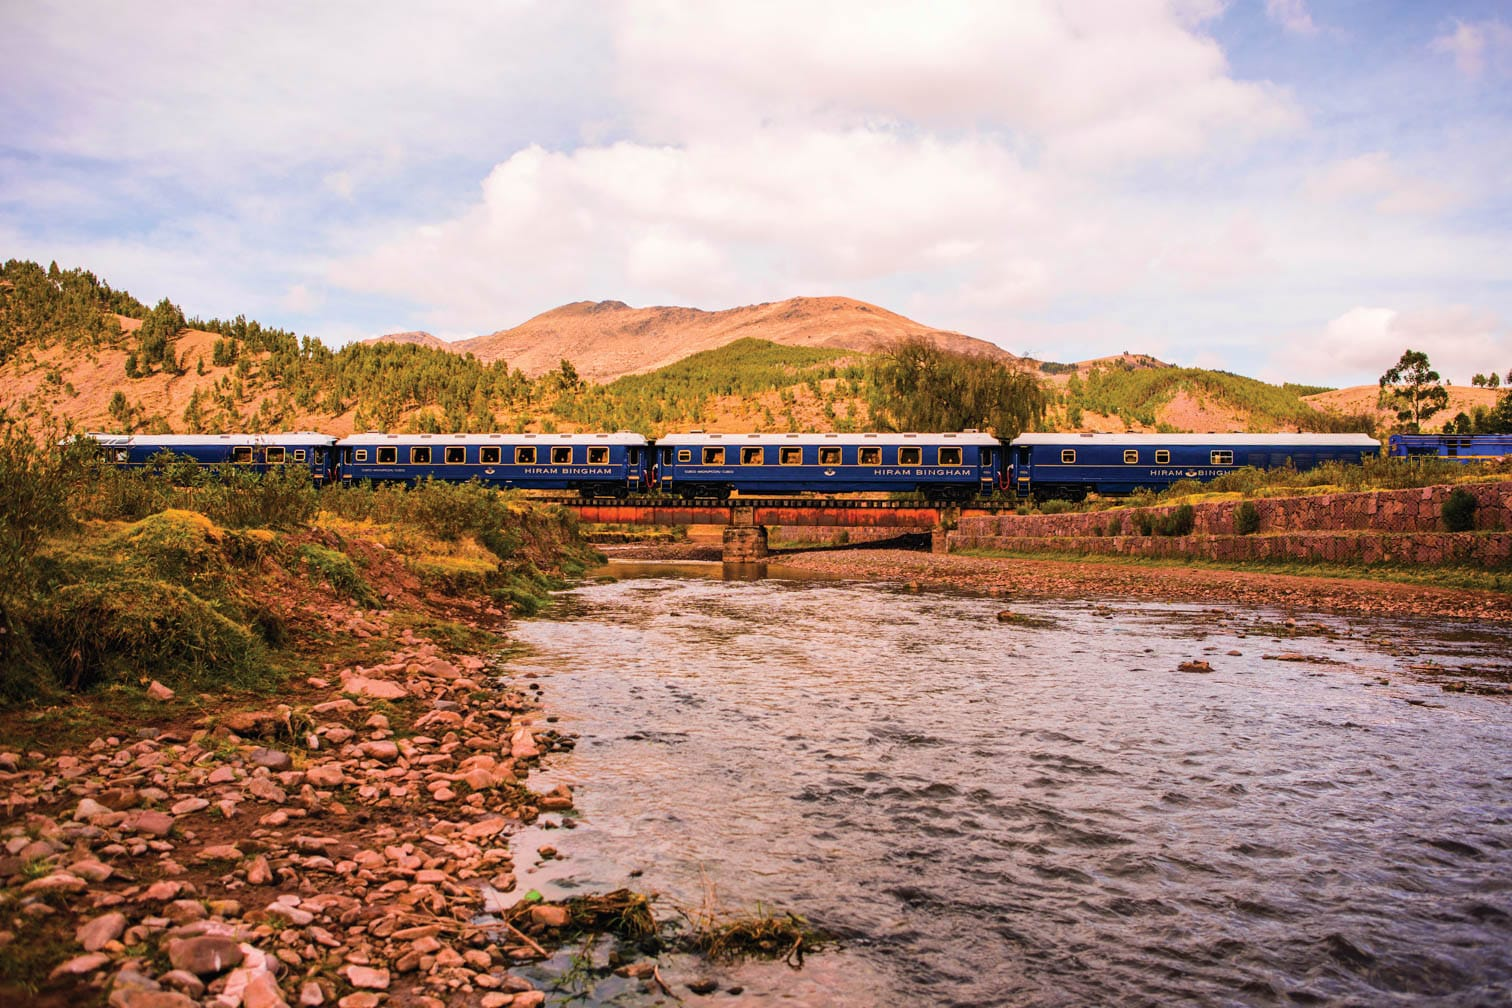 Belmond Hiram Bingham train traveling past water and mountains